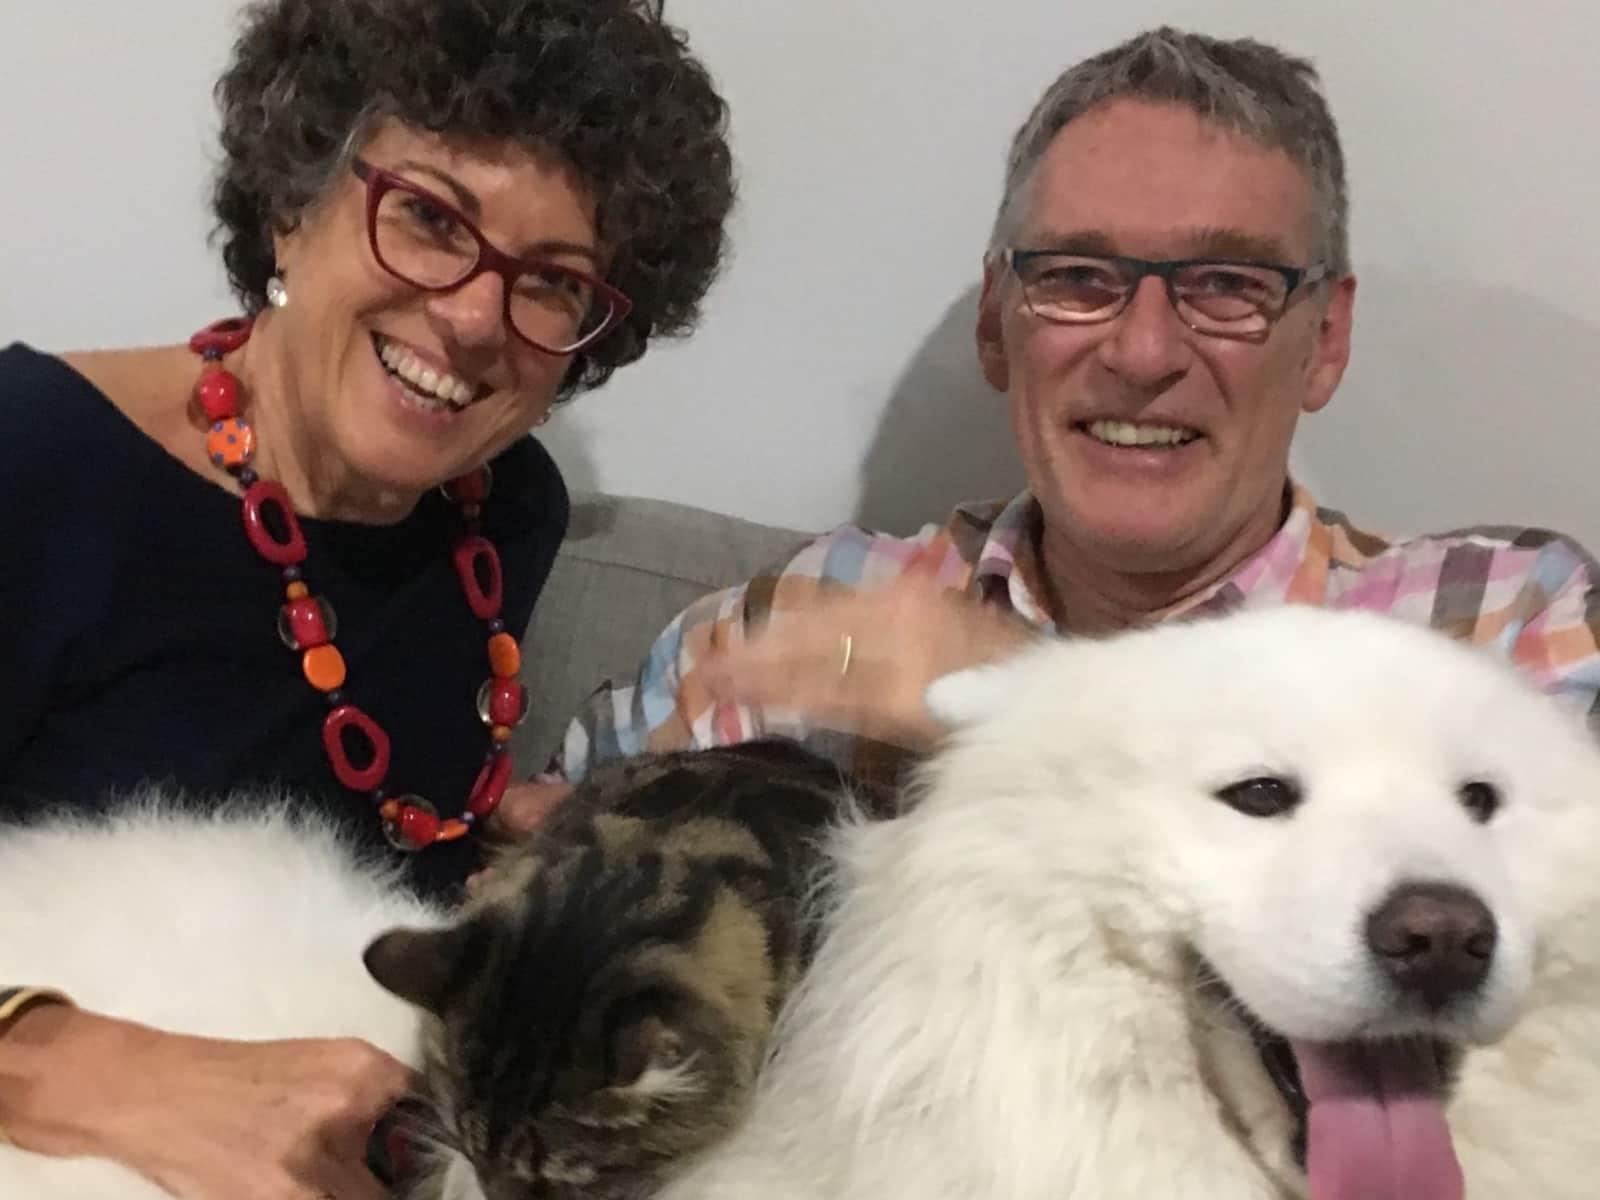 Sonia & gordon & Gordon from Sydney, New South Wales, Australia